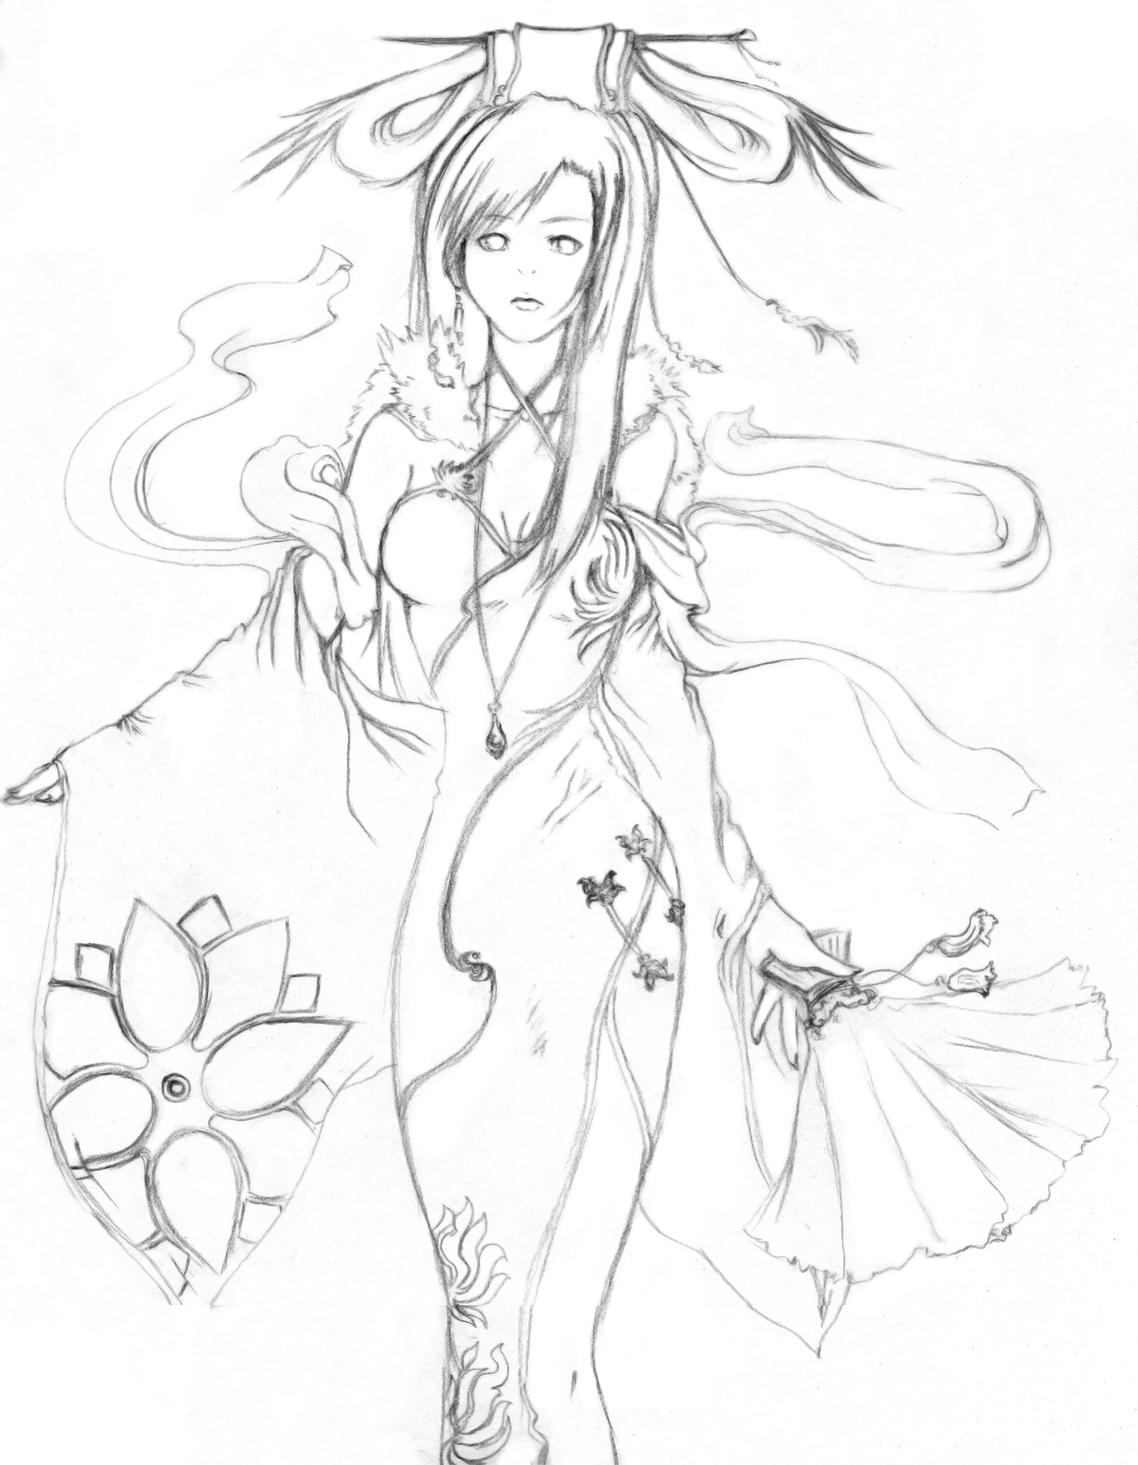 1138x1465 Princess Kim Outline By Crappyartisttumte